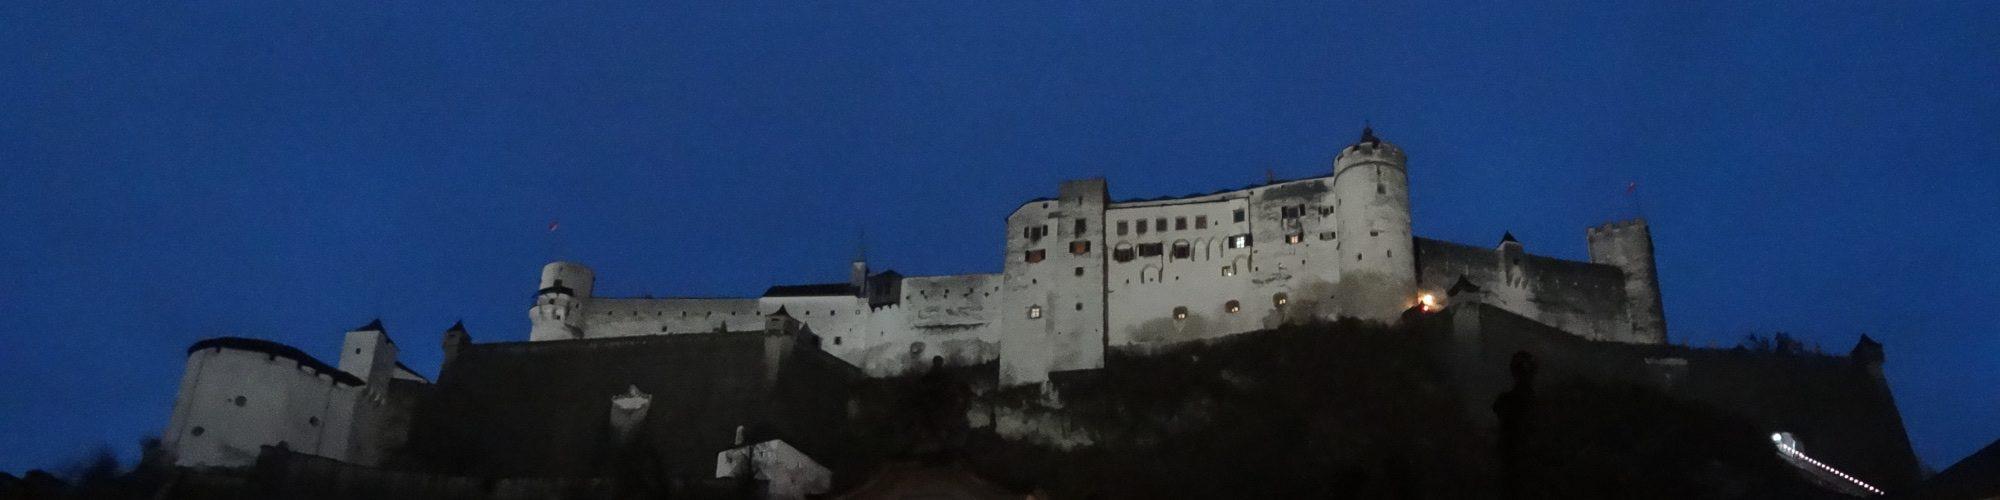 Fortress Hohensalzburg by night